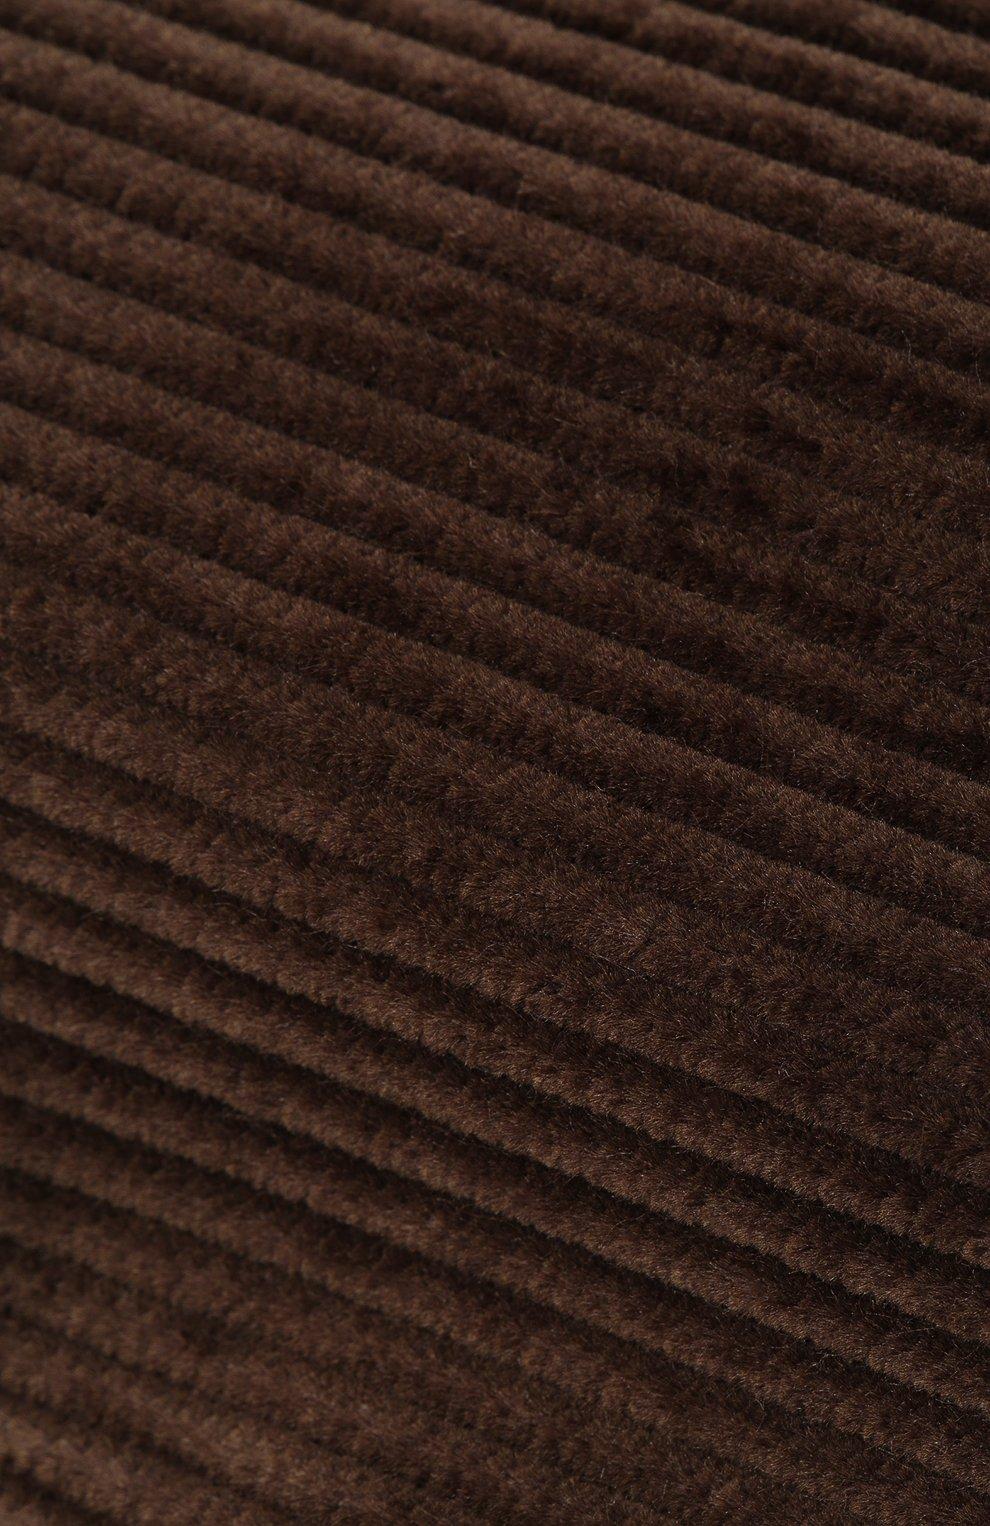 Мужская хлопковое кепи DOLCE & GABBANA коричневого цвета, арт. GH587A/FUVC7 | Фото 3